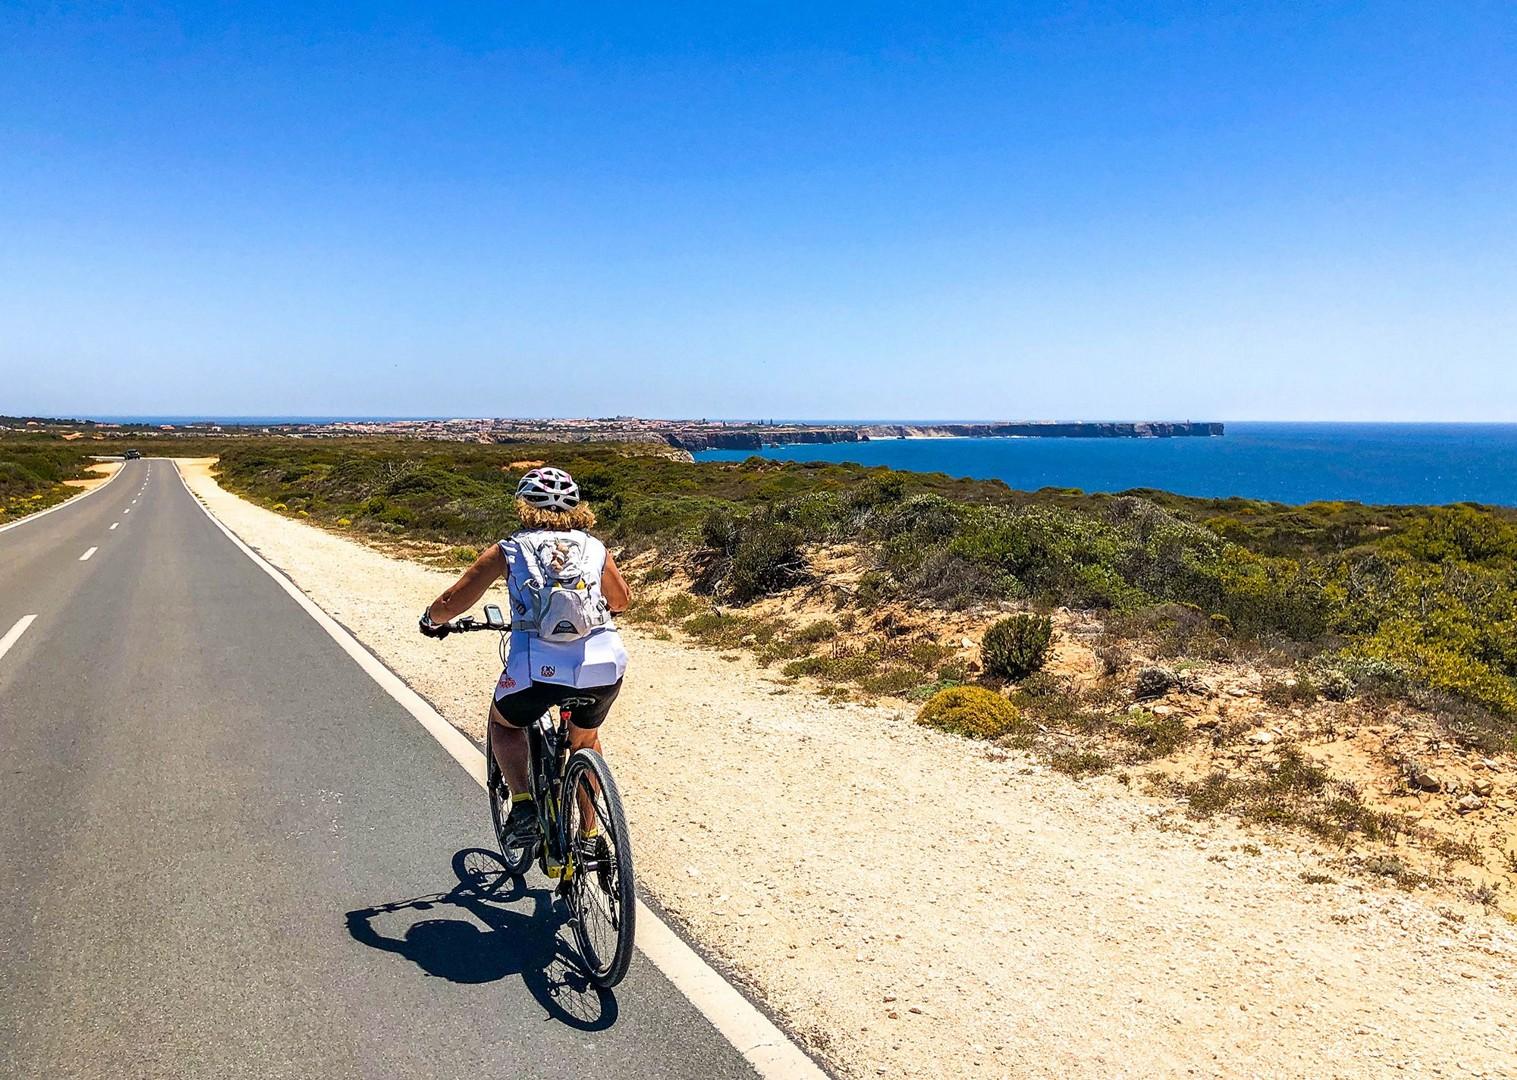 self-guided-leisure-cycling-holiday-portugal-algarve-coastal-explorer.jpg - Portugal - Alentejo and Algarve Coastal Explorer - Self-Guided Leisure Cycling Holiday - Leisure Cycling